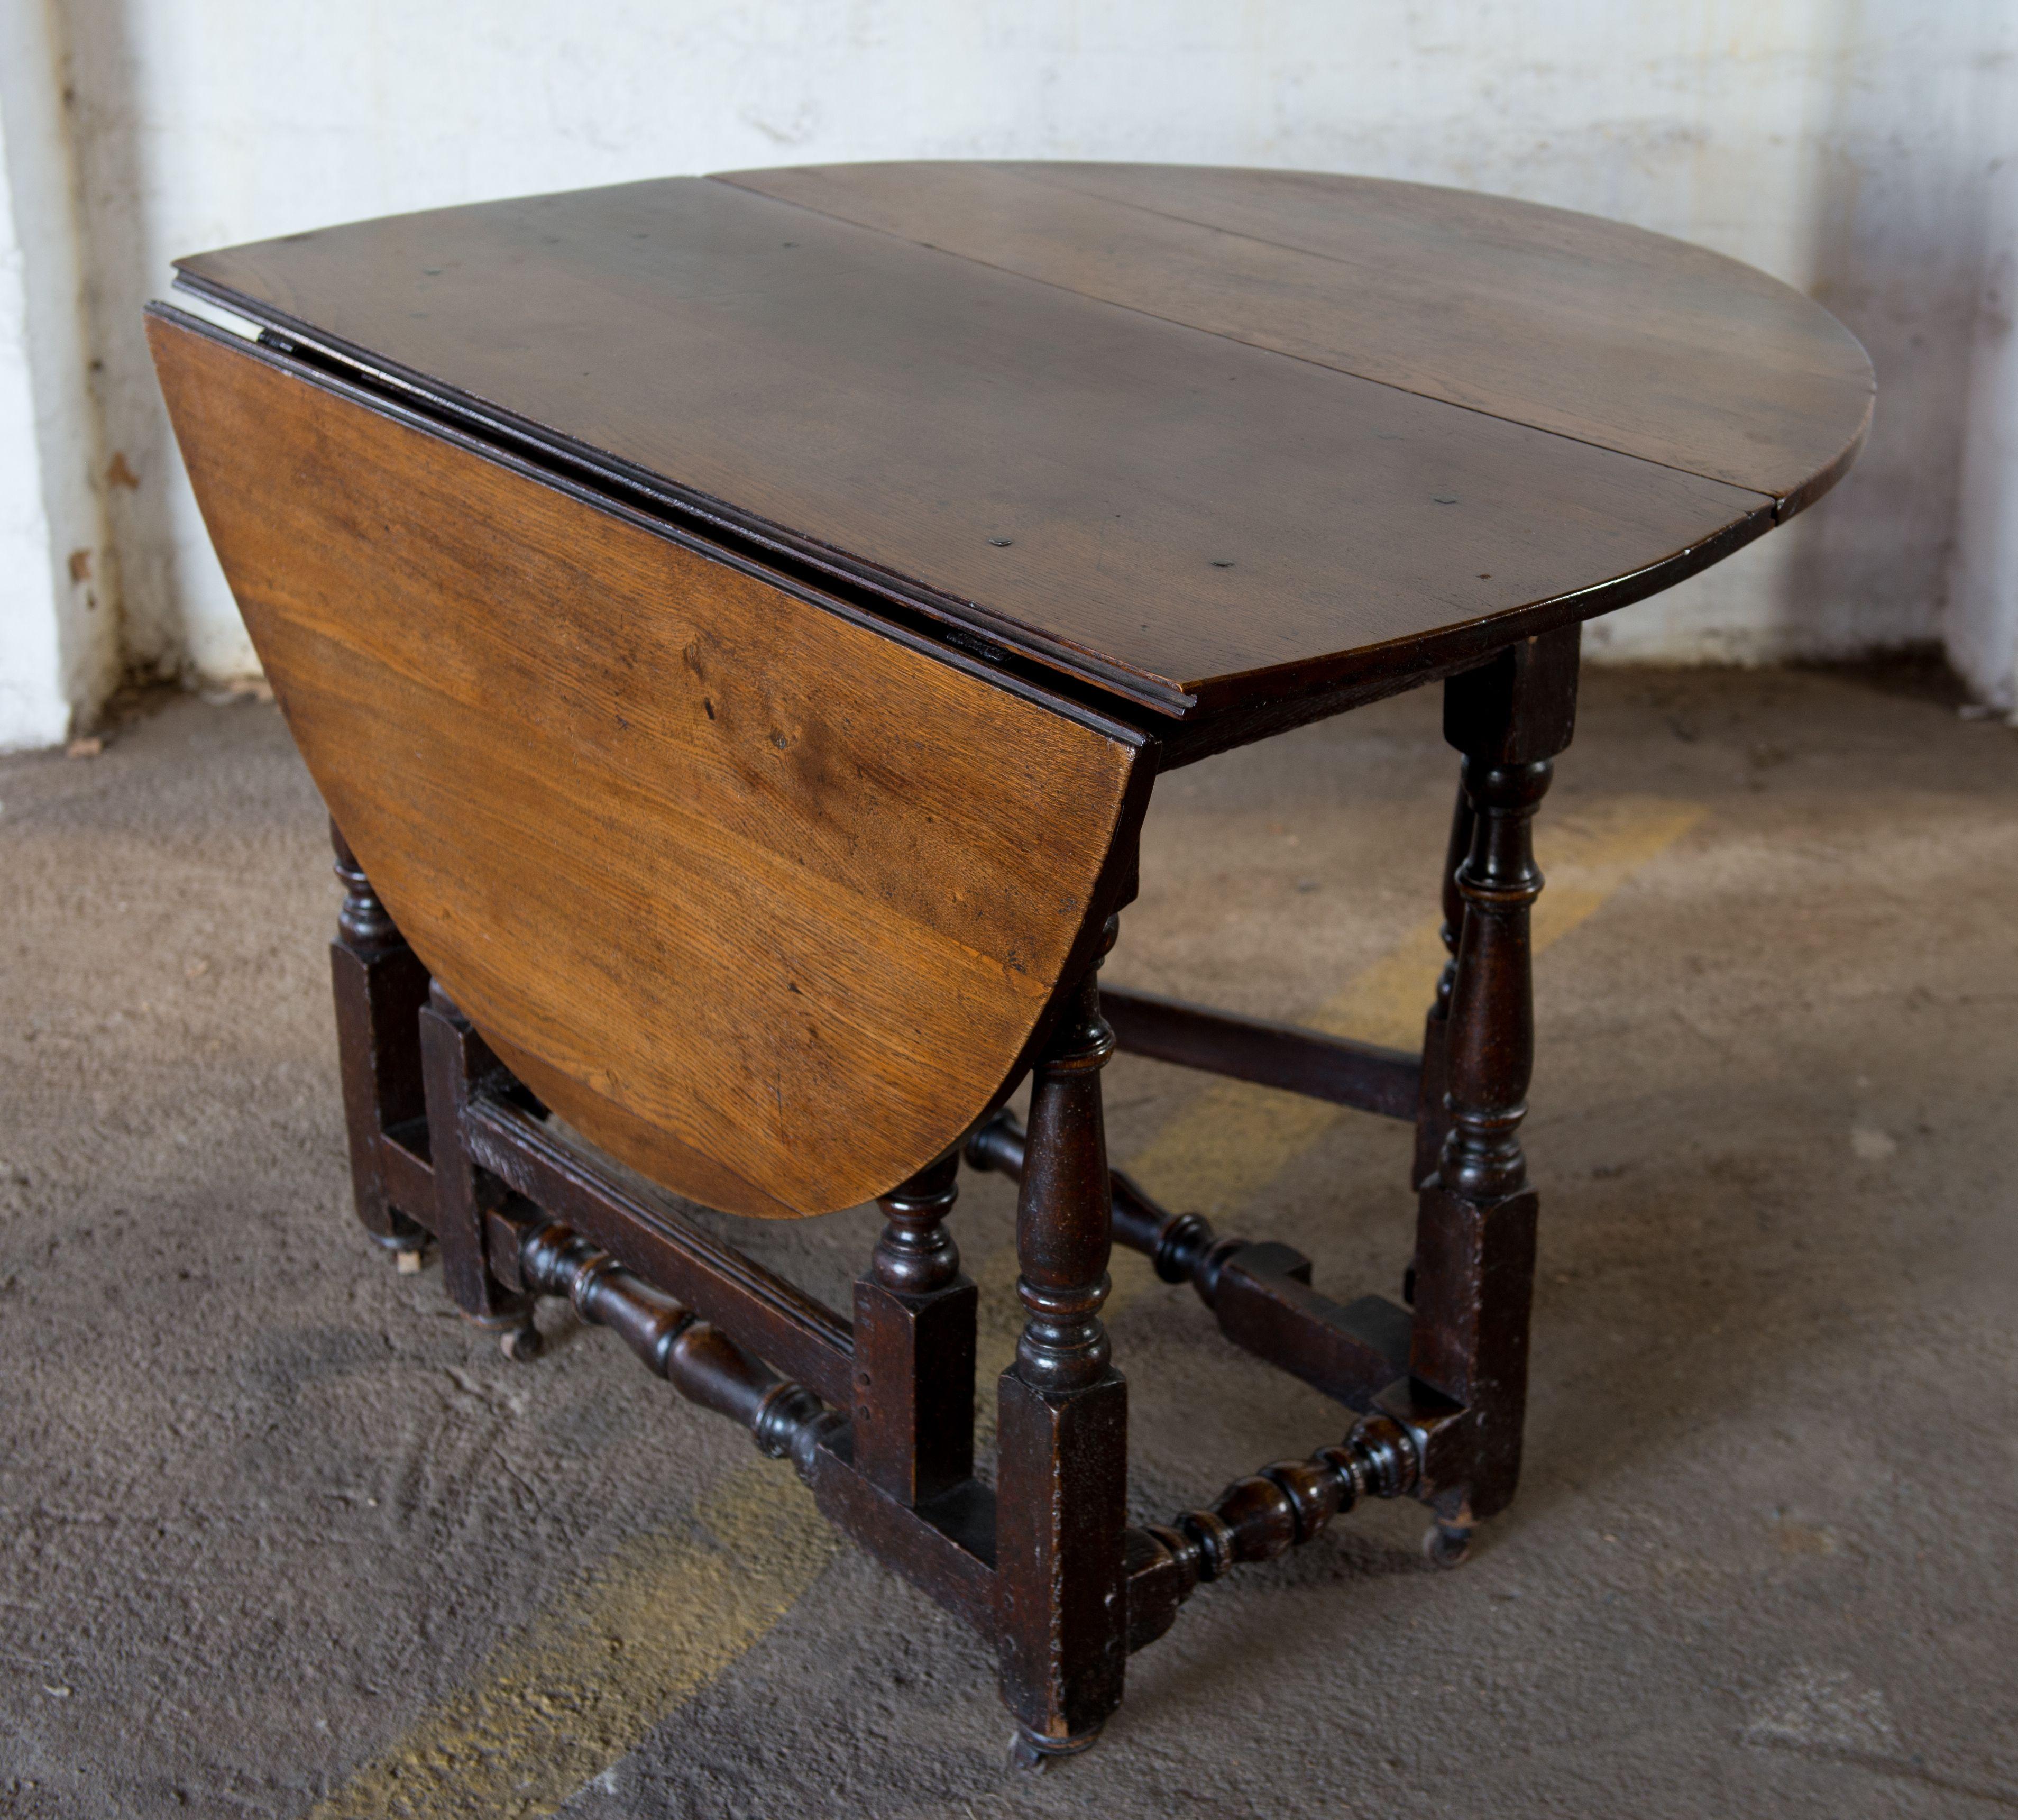 Furniture Legs Johannesburg northcliffantiques this gate-leg classic antique table is